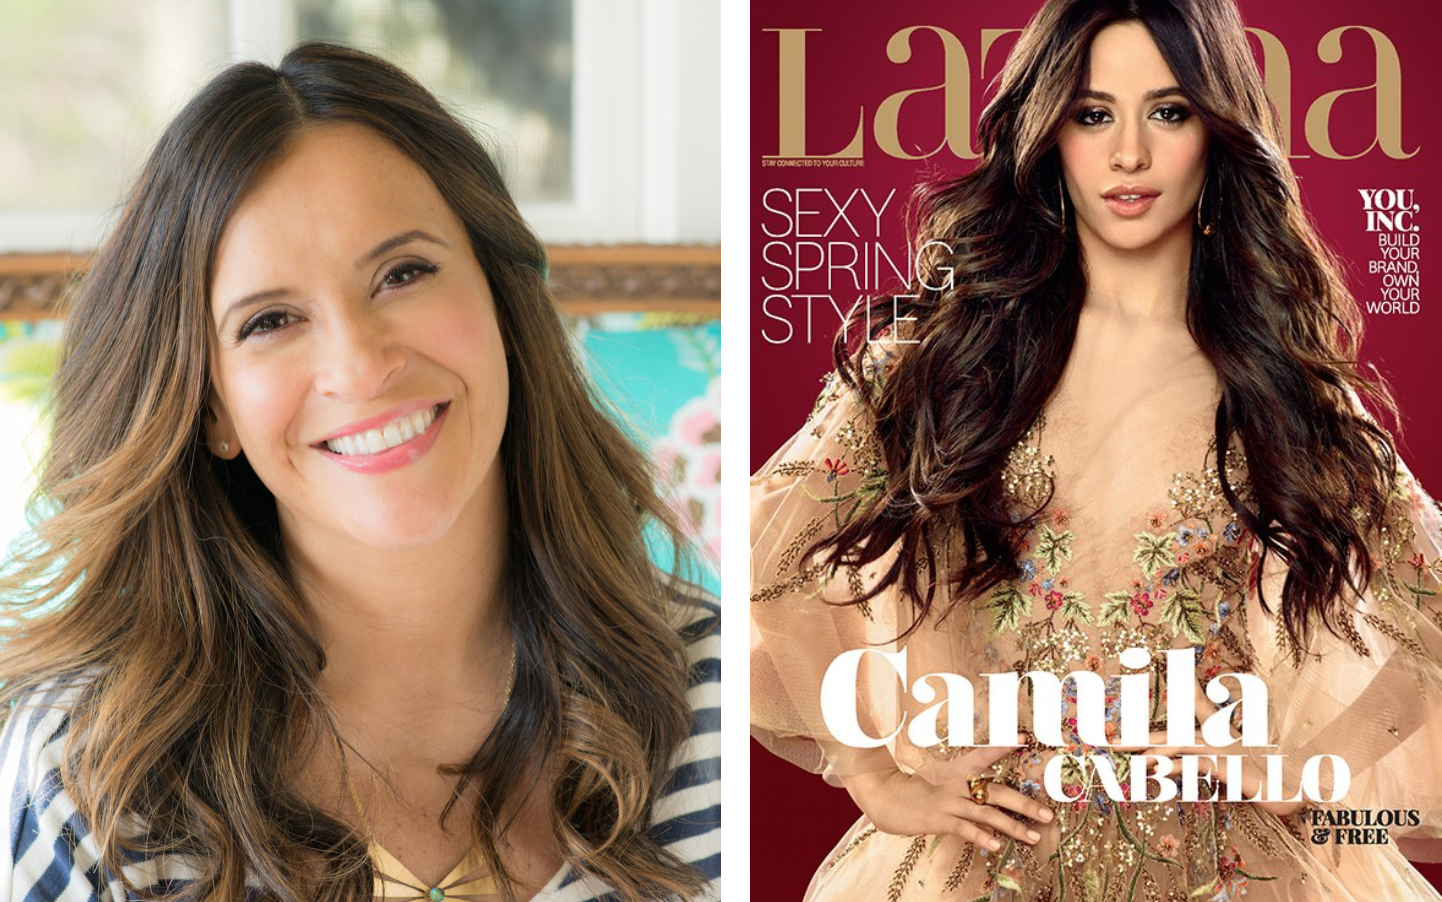 Latina promotes Moreno as magazine experiences financial troubles